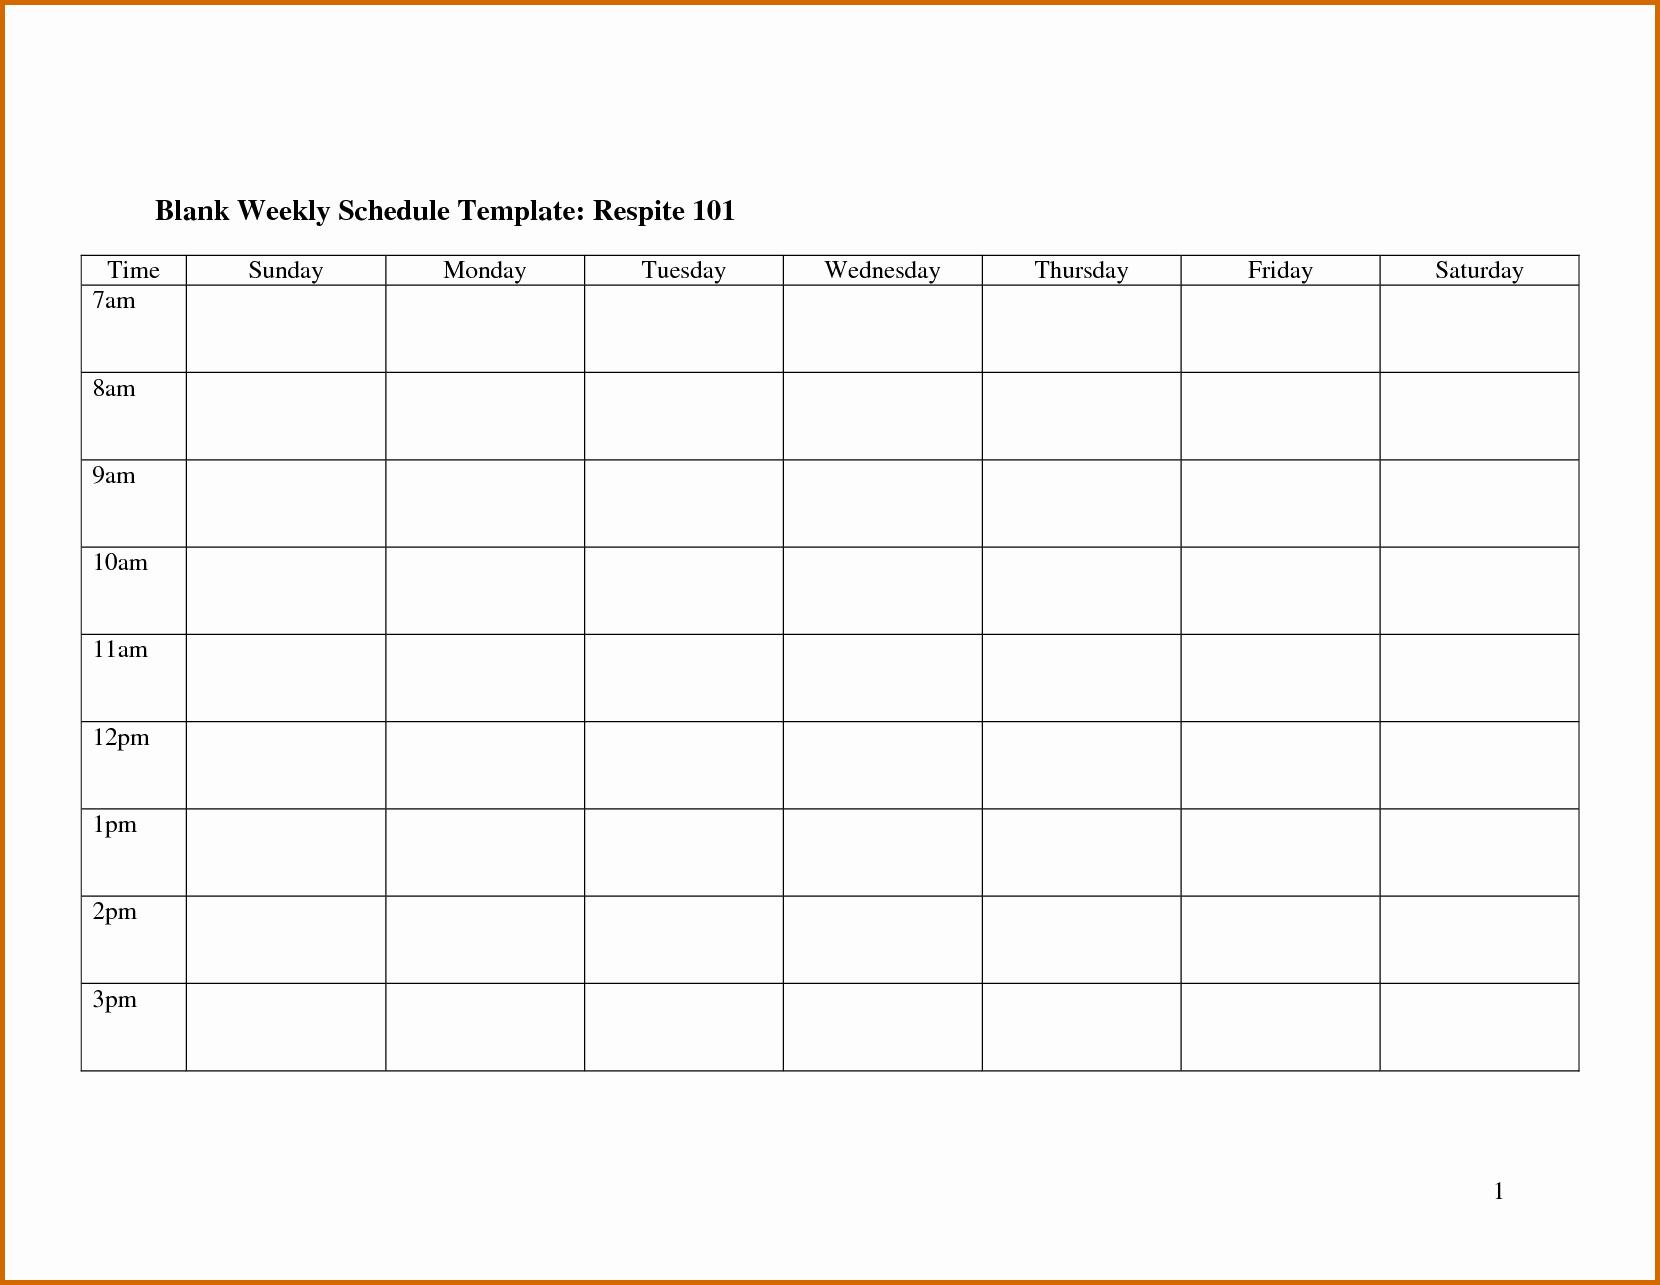 Employee Monthly Work Schedule Template Unique Blank Weekly Employee Schedule Template to Pin On